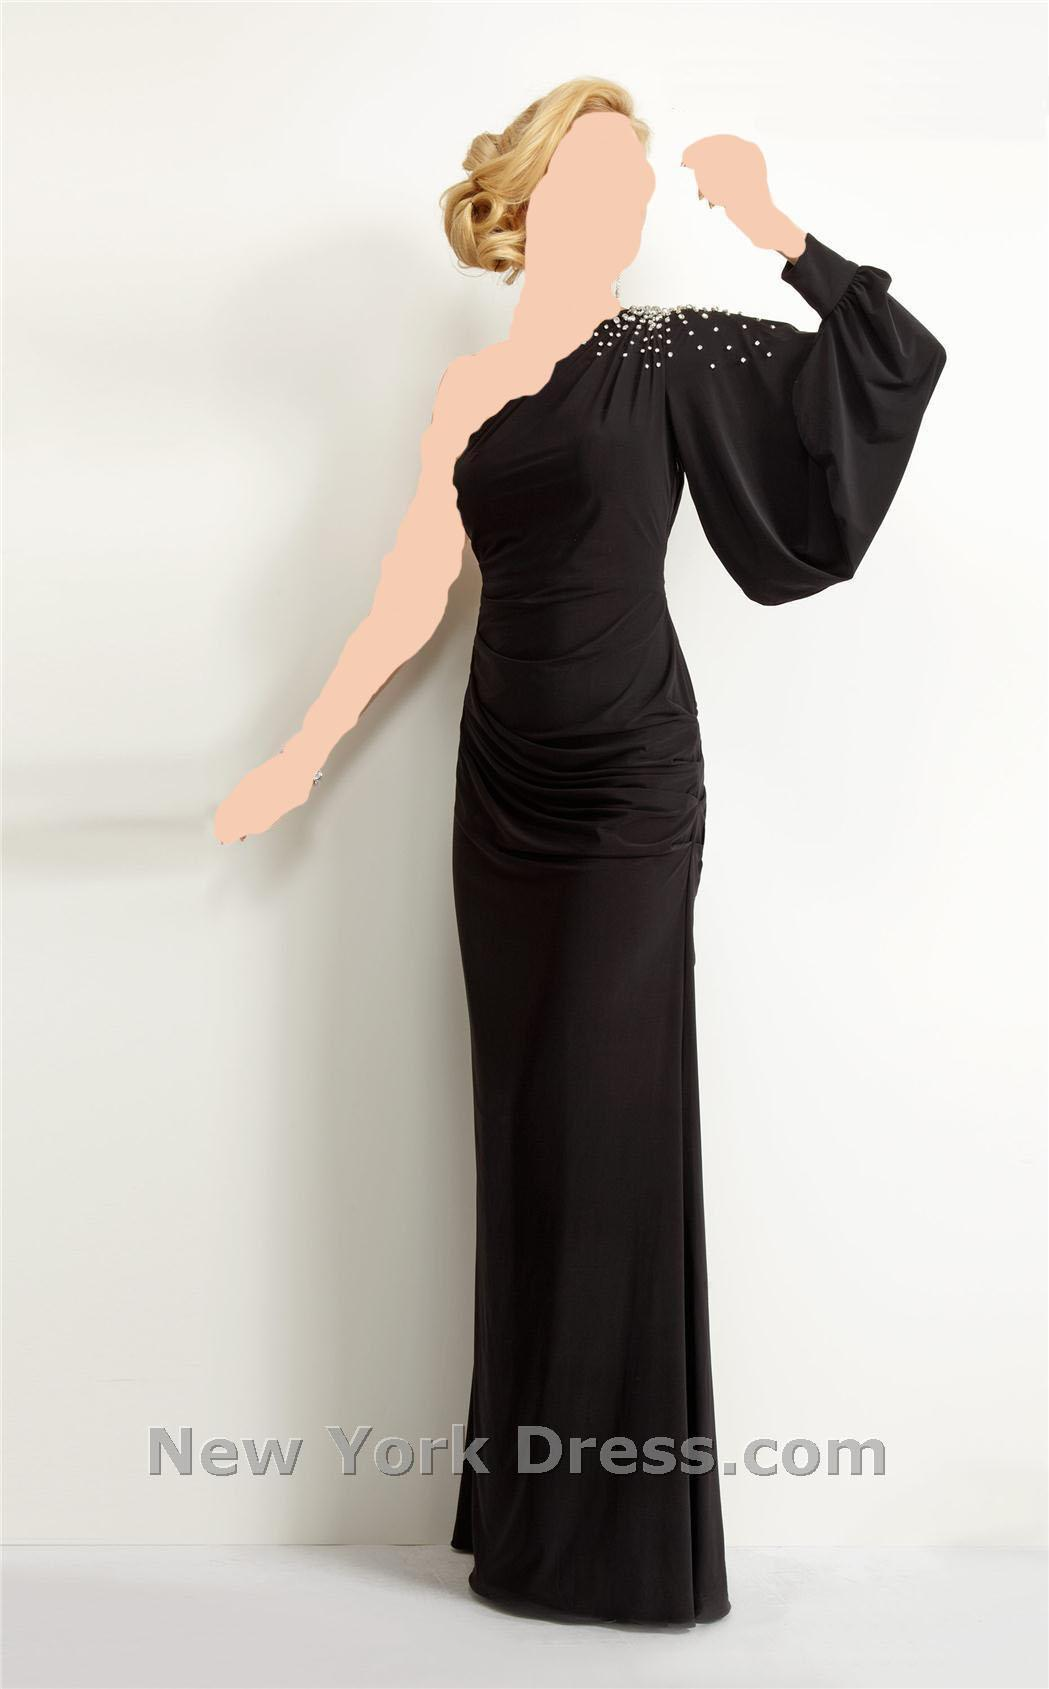 dresses 2Evening Dresses 2Evening Dresses 2011Evening Dresses 2011Evening Dresses 2011Evening